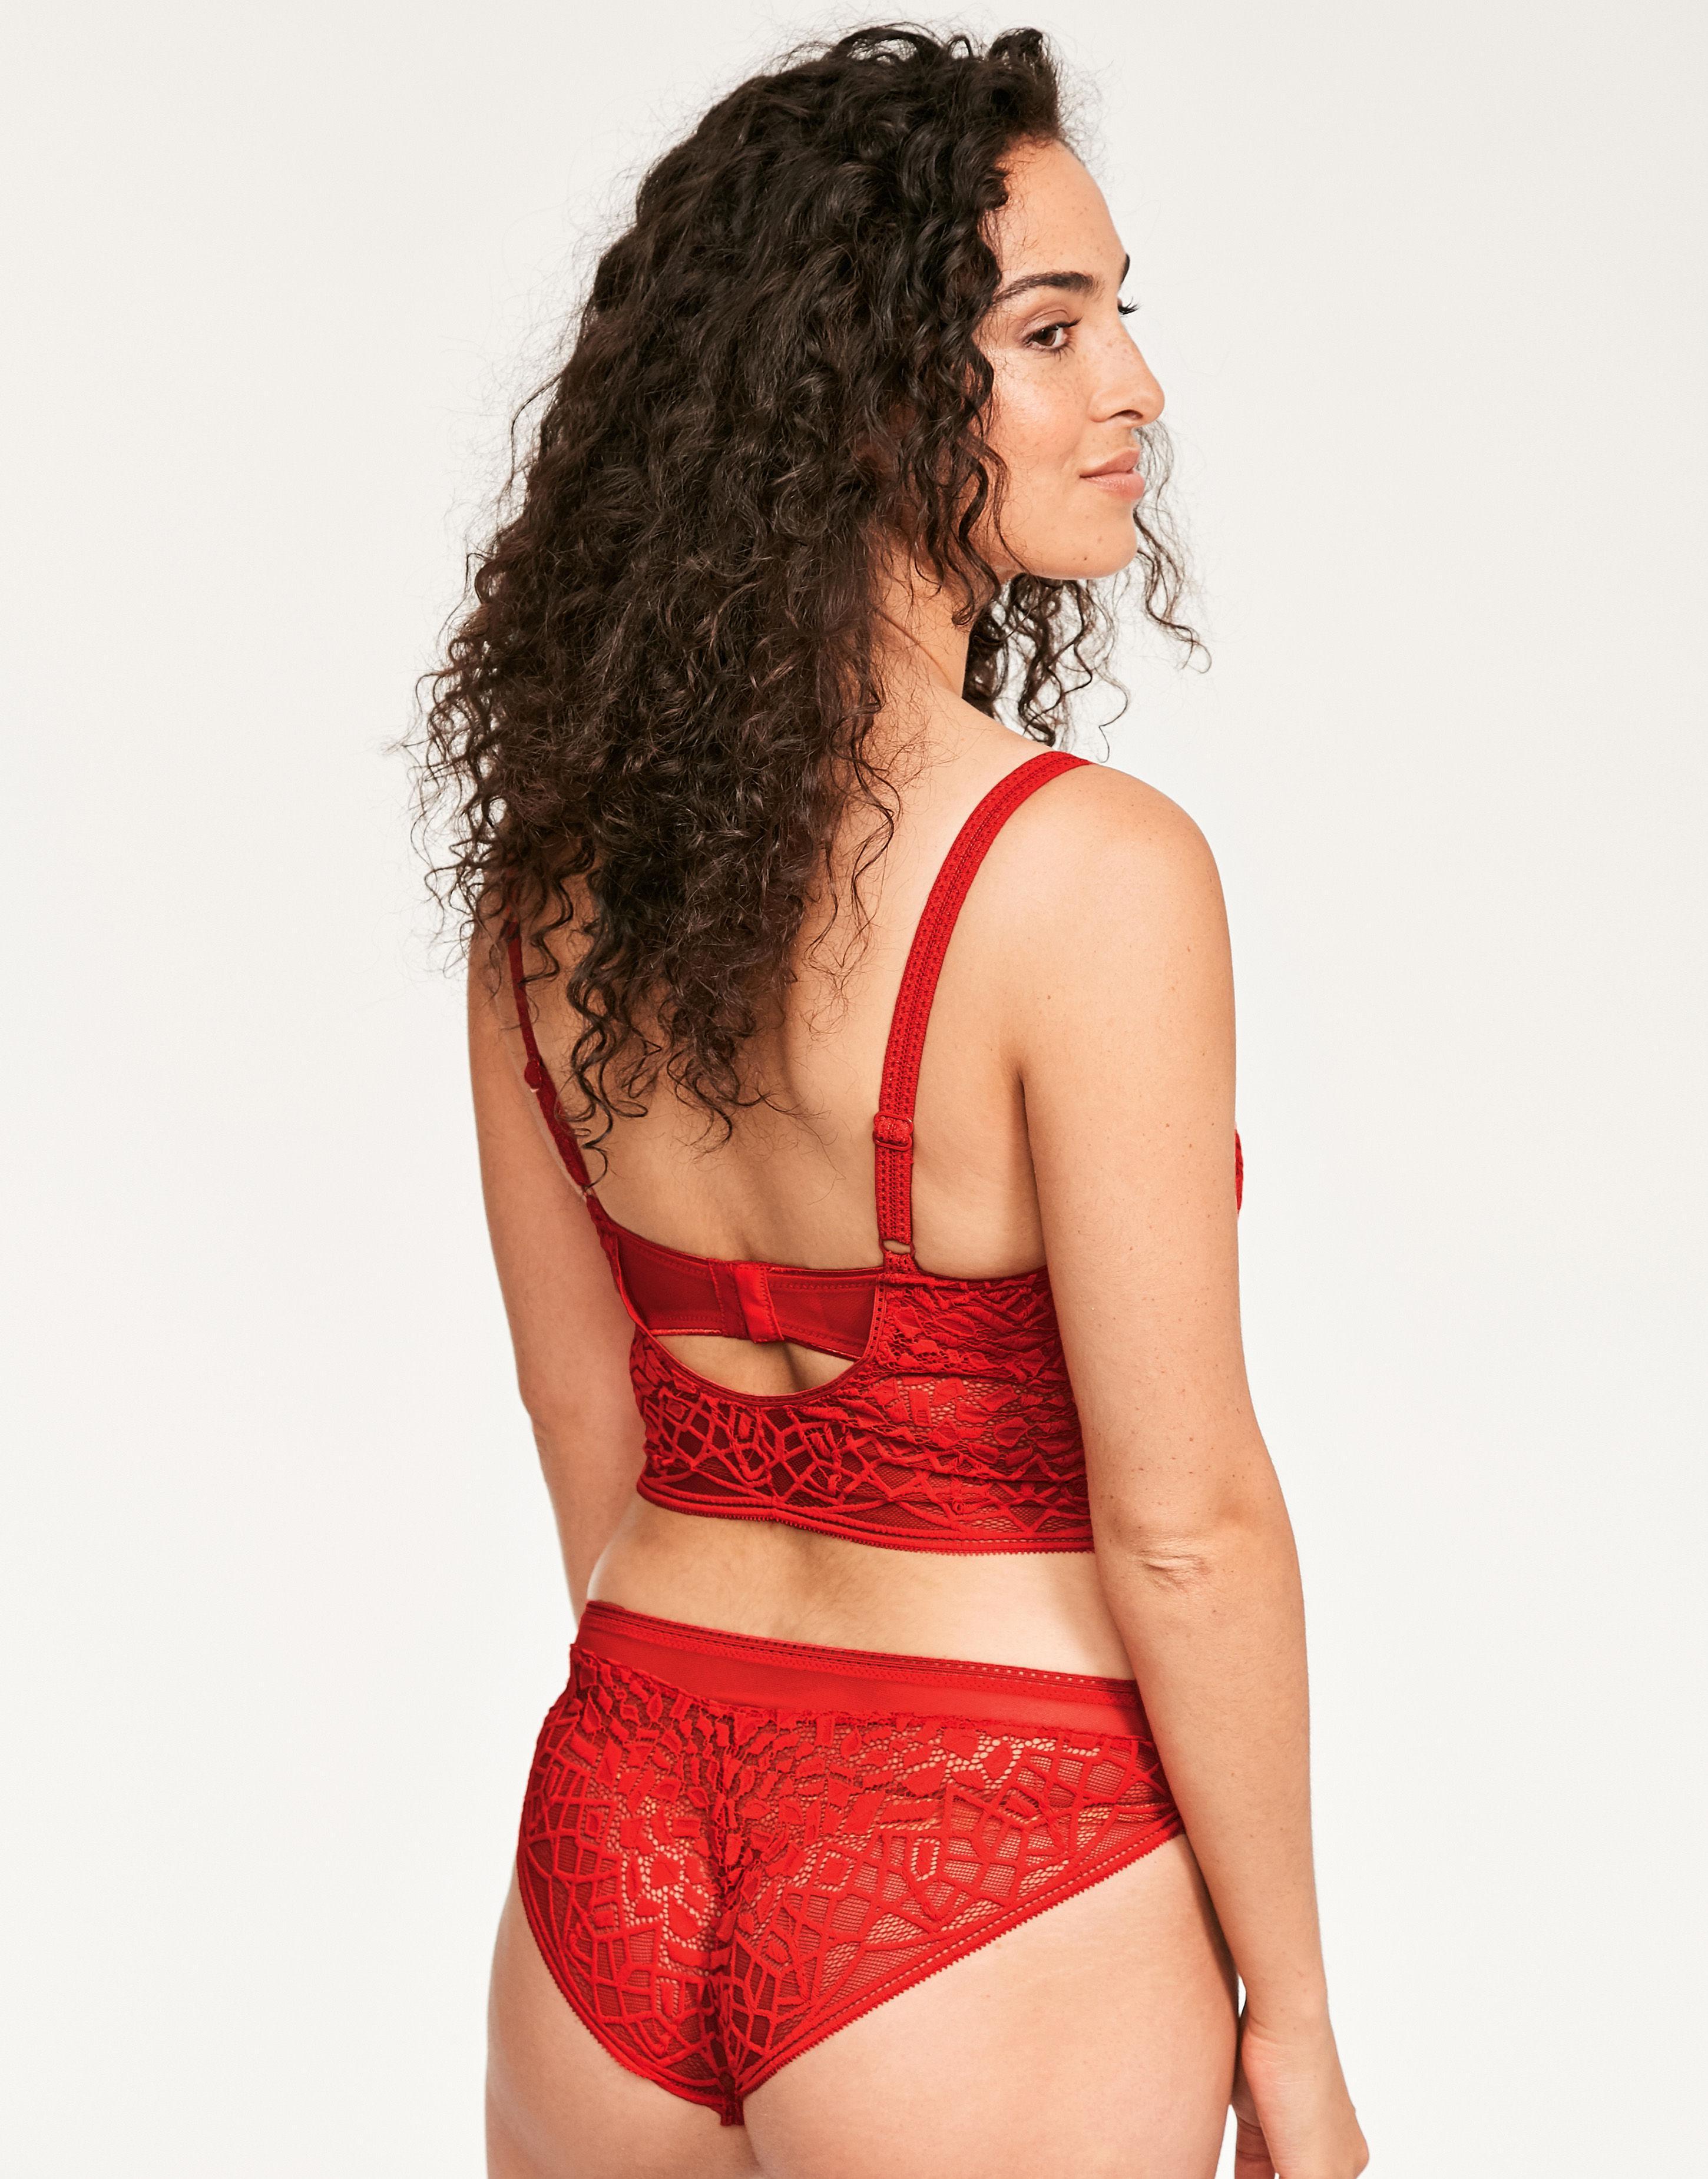 7fffa985a3bb2 Freya Soiree Lace Underwire Bralette in Red - Lyst